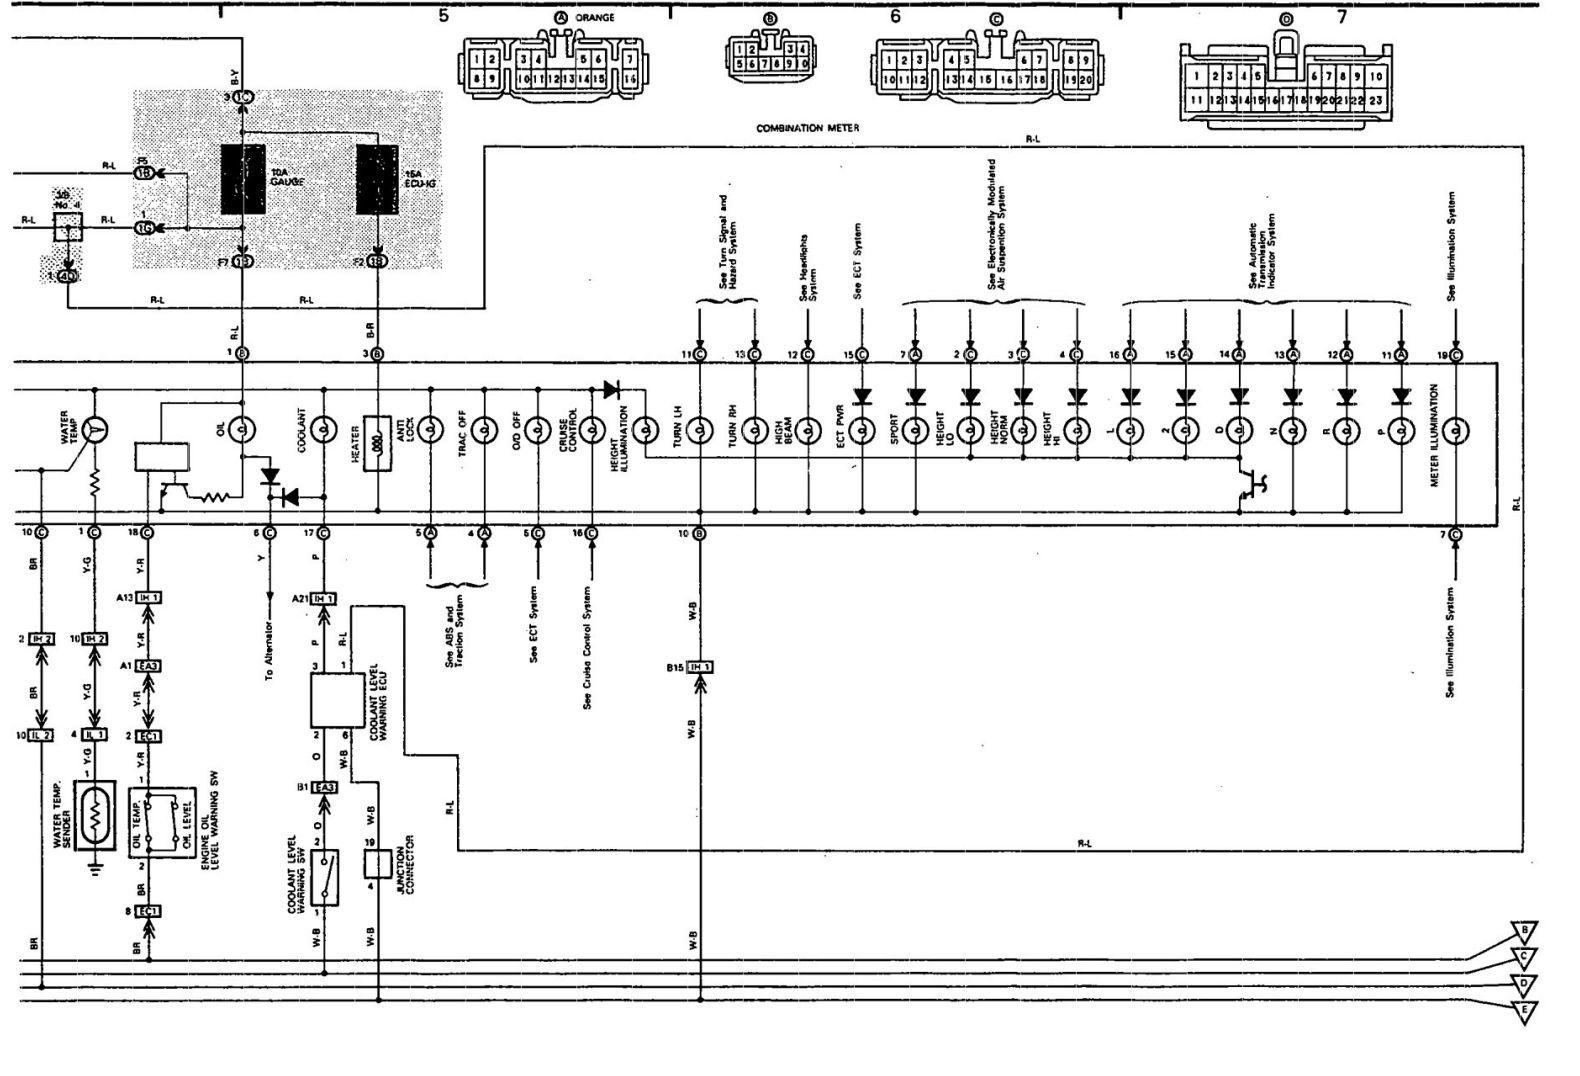 2003 Lincoln Ls Engine Diagram Pcv Valve